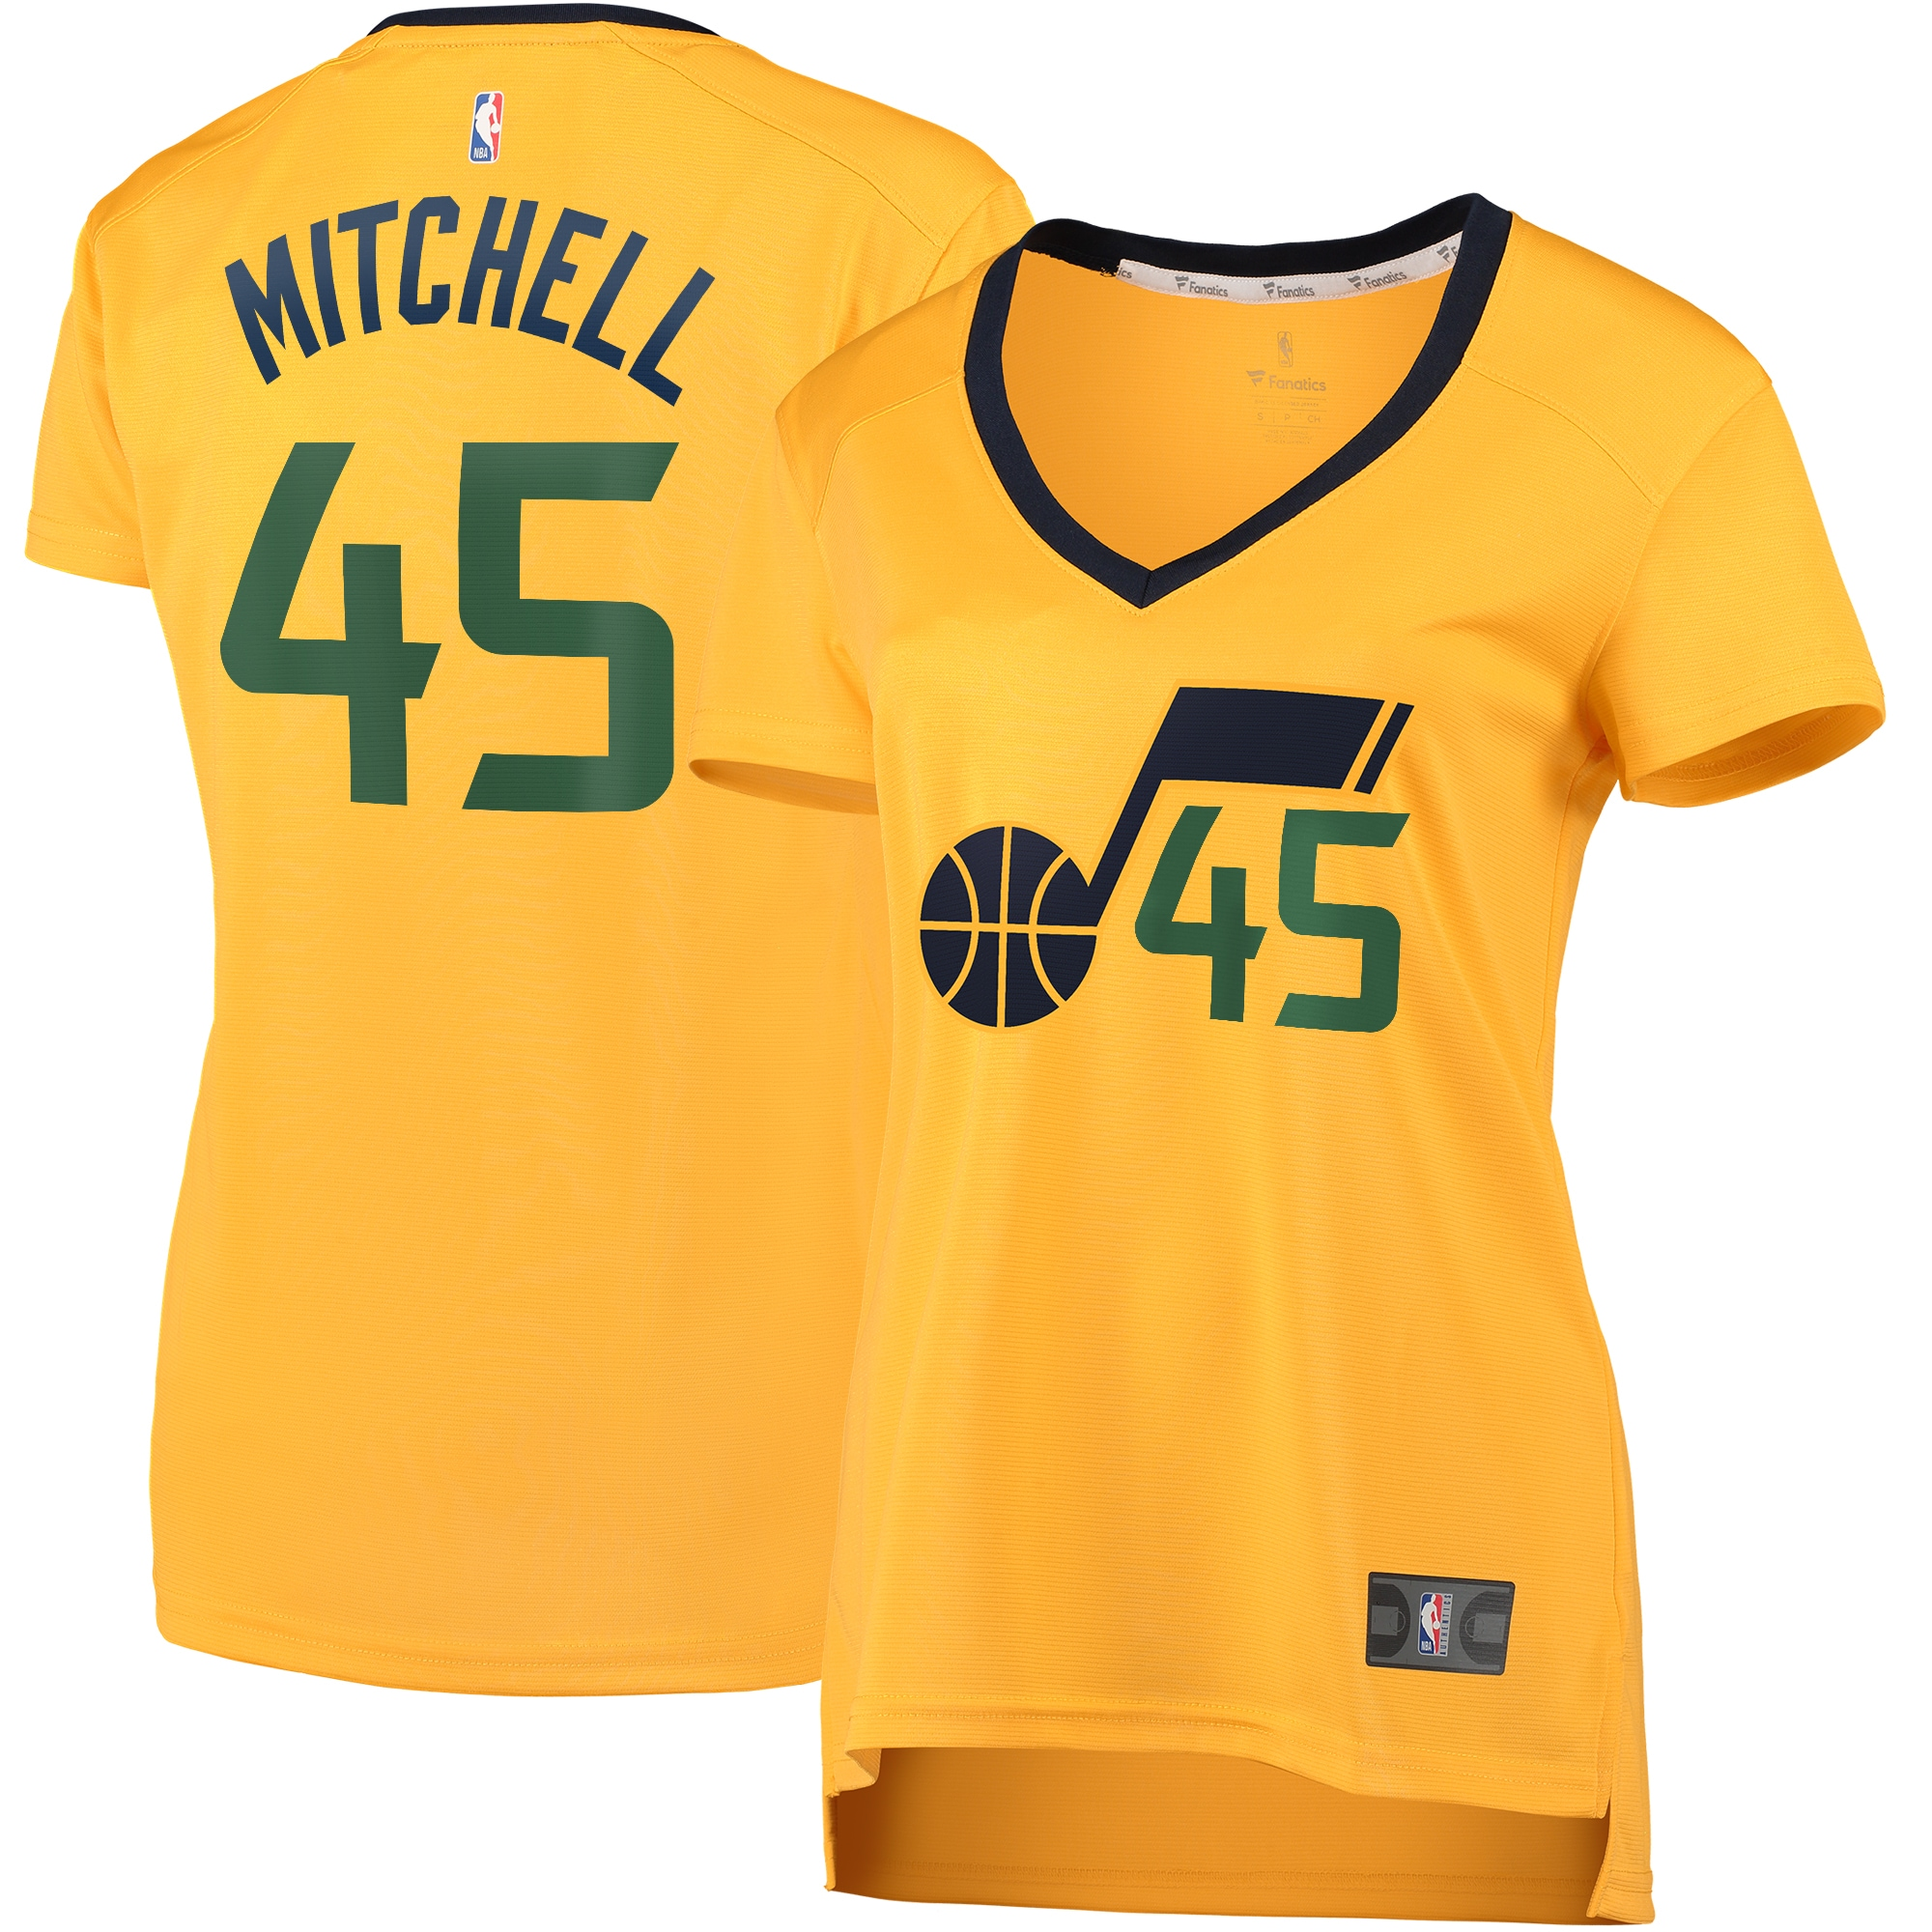 Donovan Mitchell Utah Jazz Fanatics Branded Women's Fast Break Player Jersey - Statement Edition - Gold